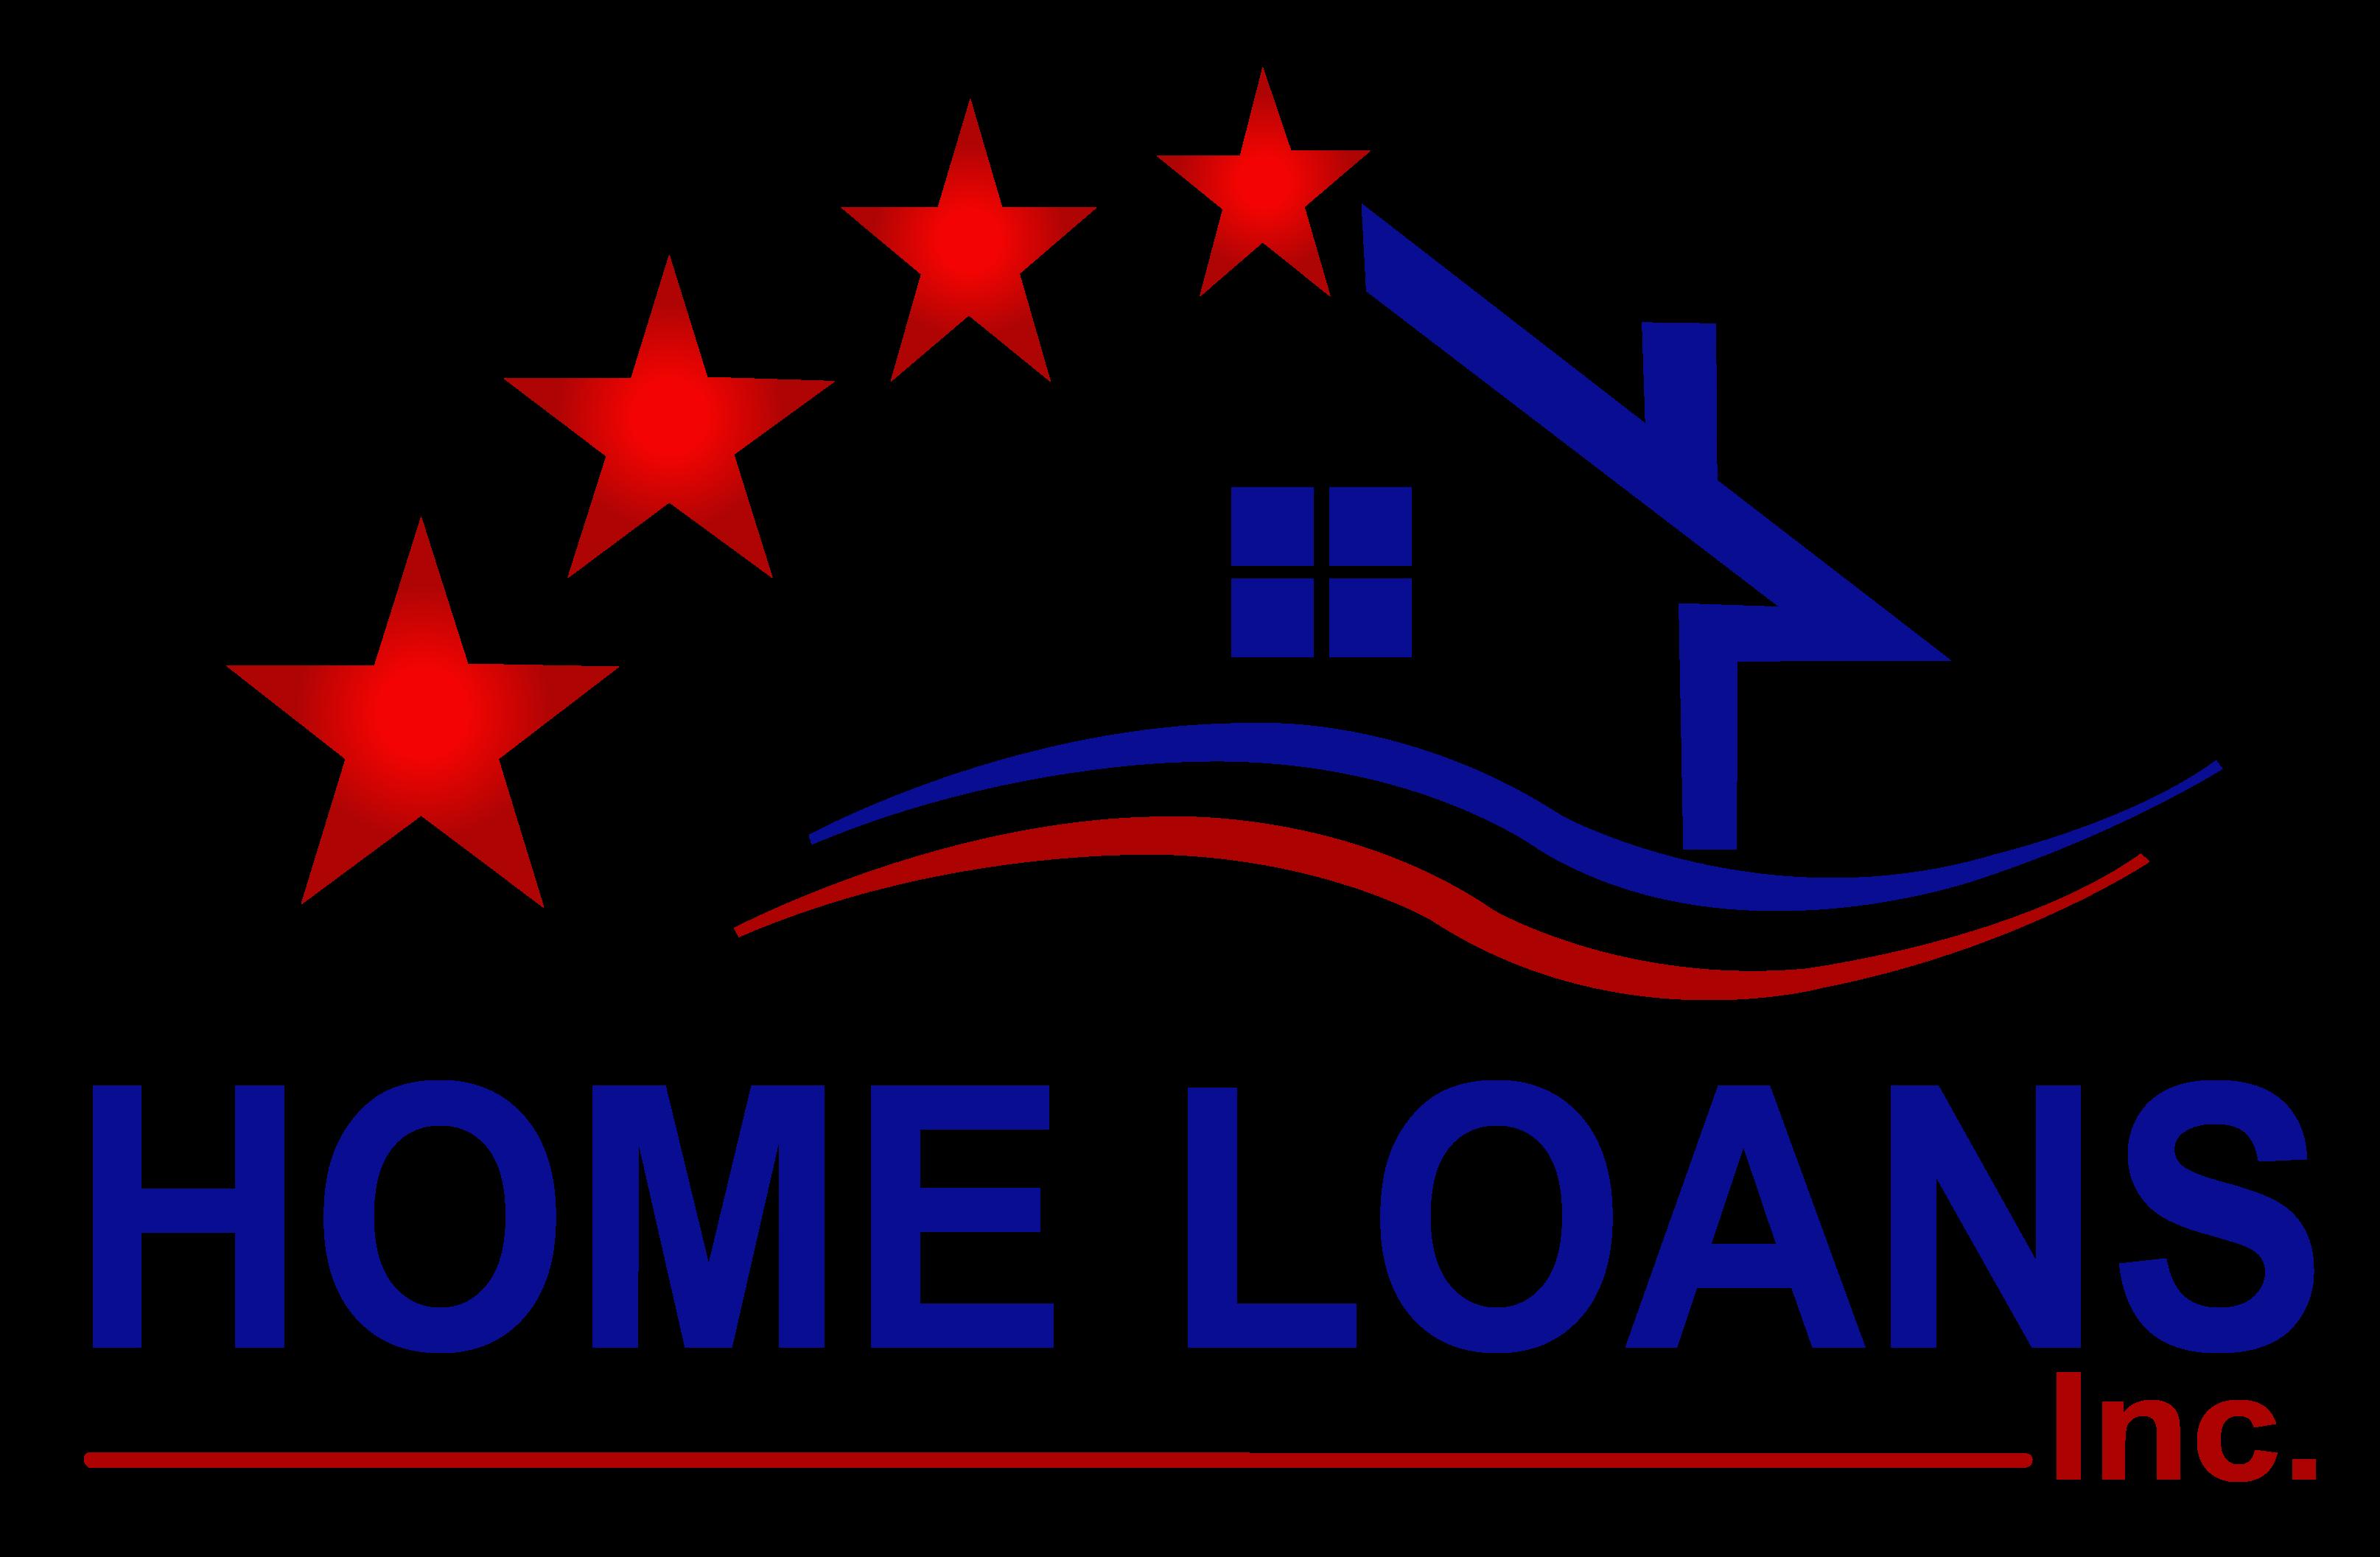 Home Loans Inc